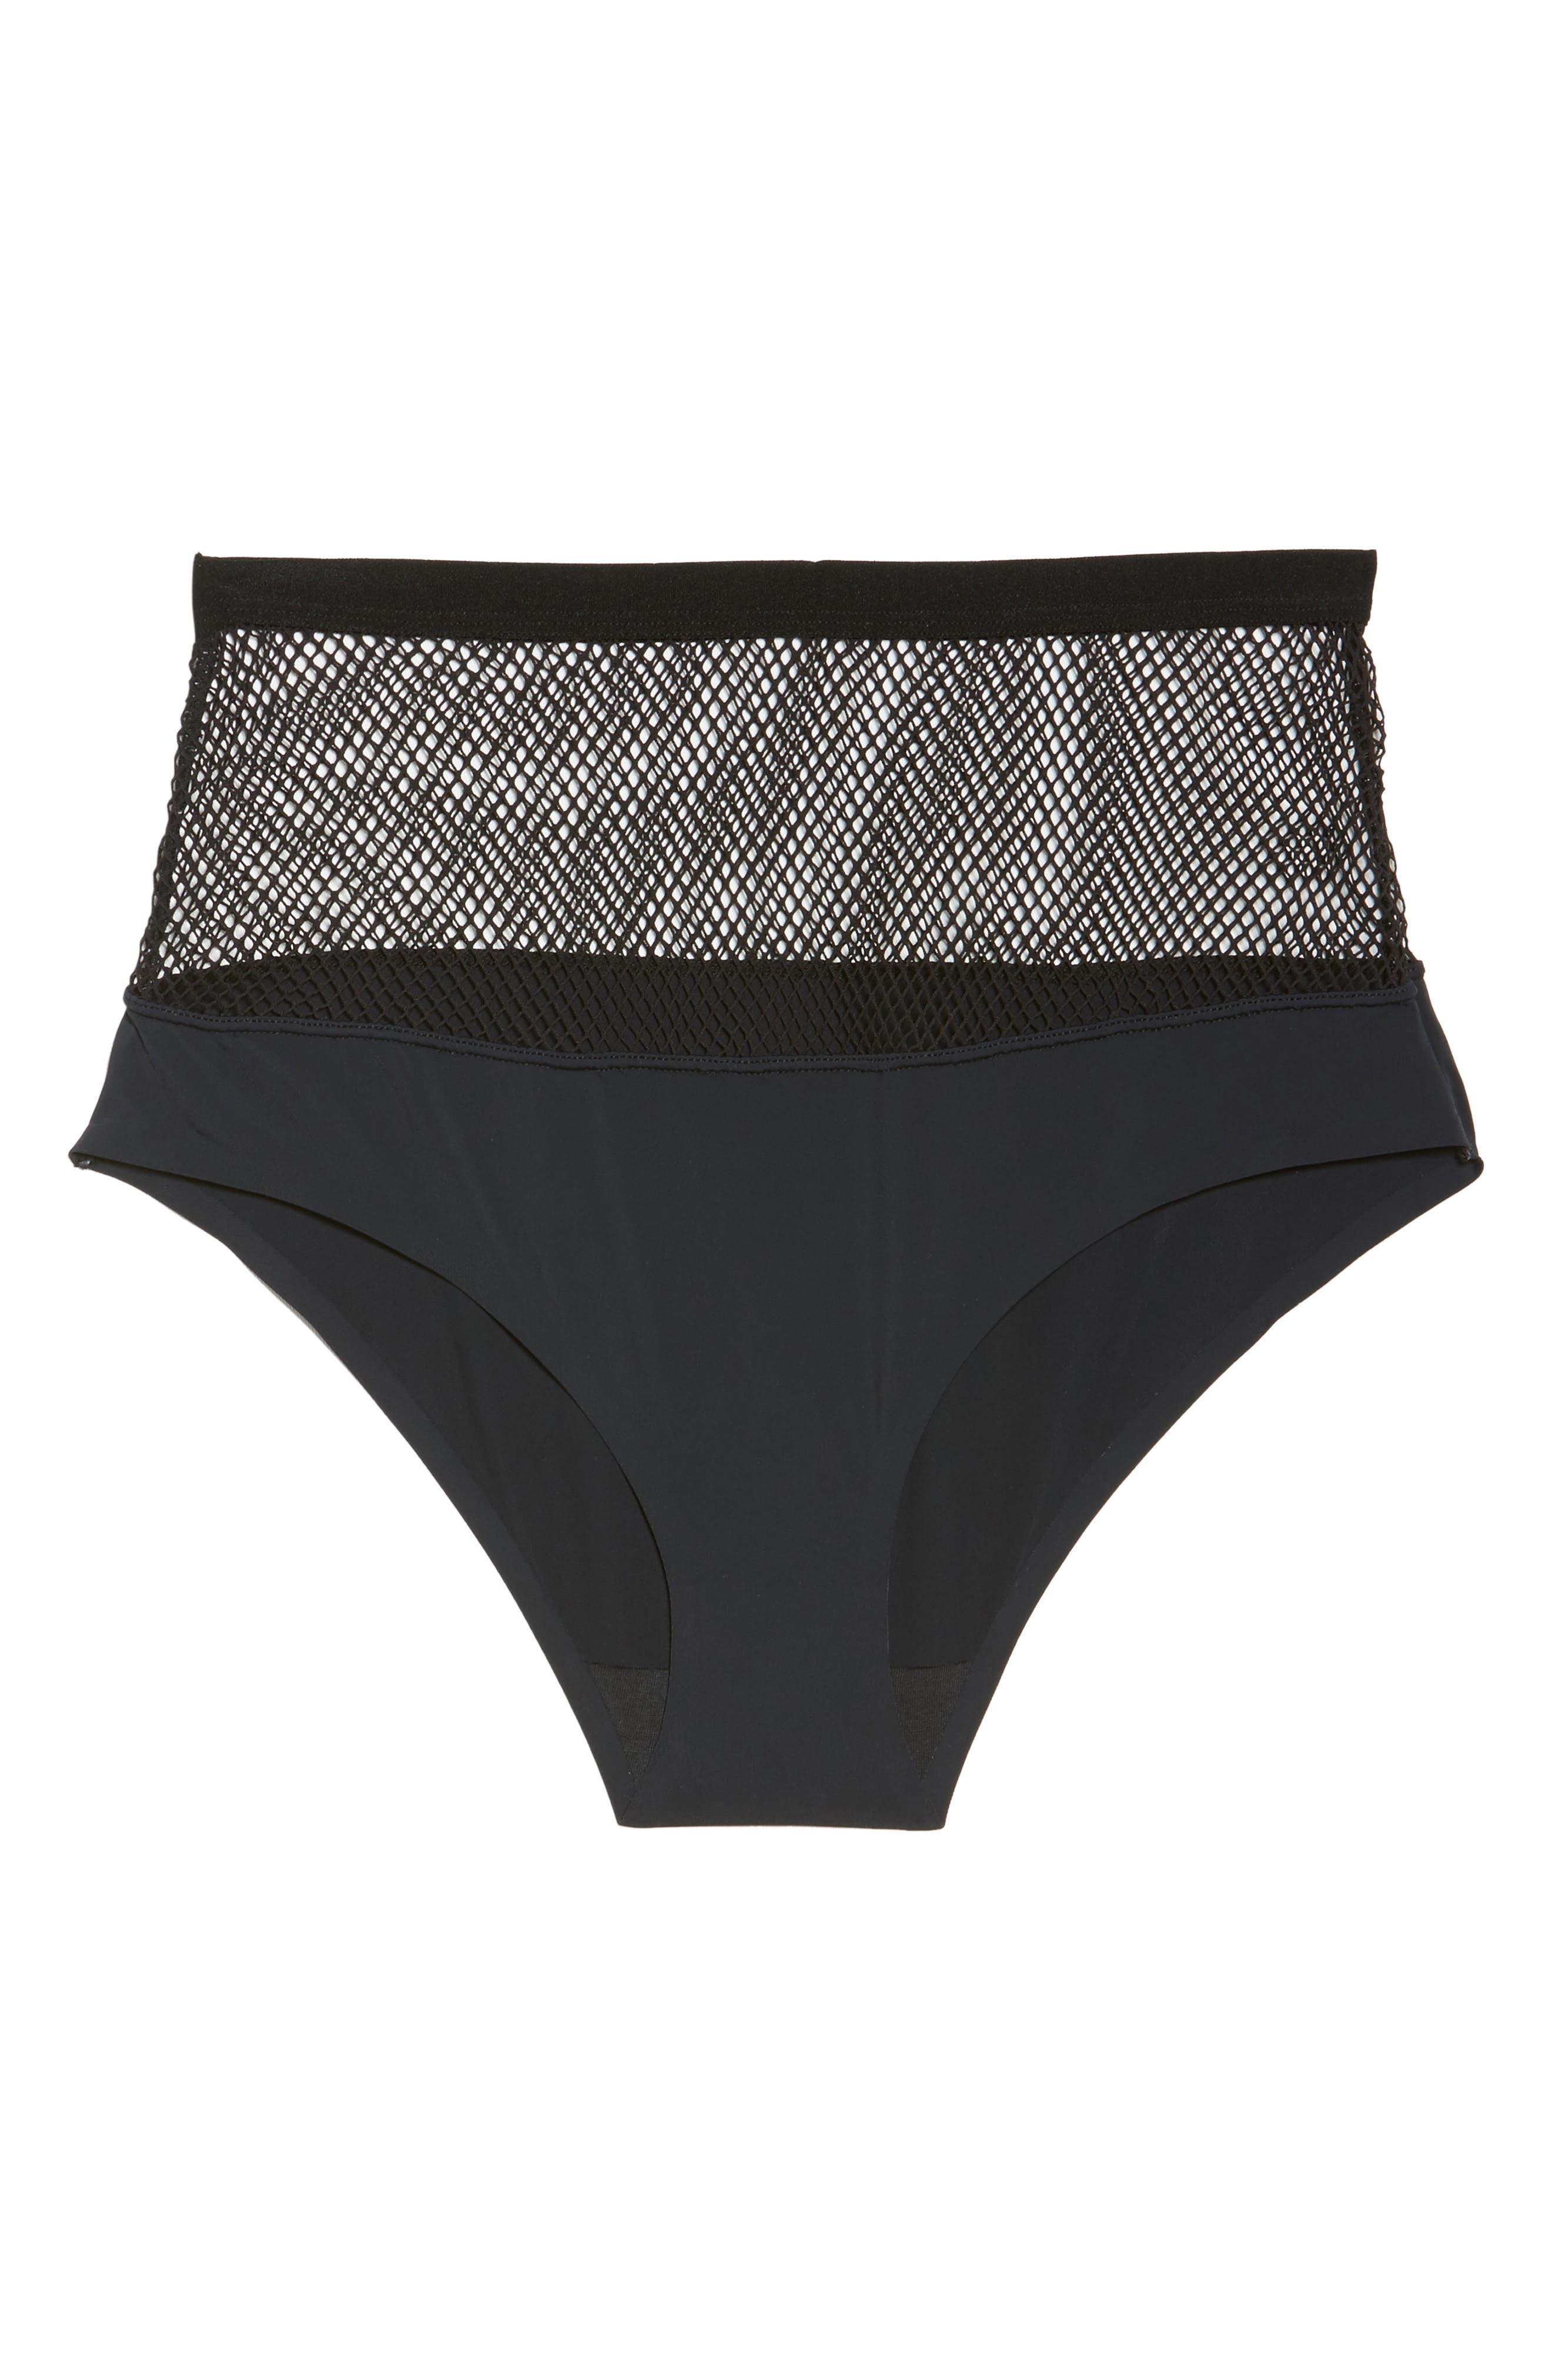 Honeydew Fishnet Hipster Panties,                             Alternate thumbnail 5, color,                             001